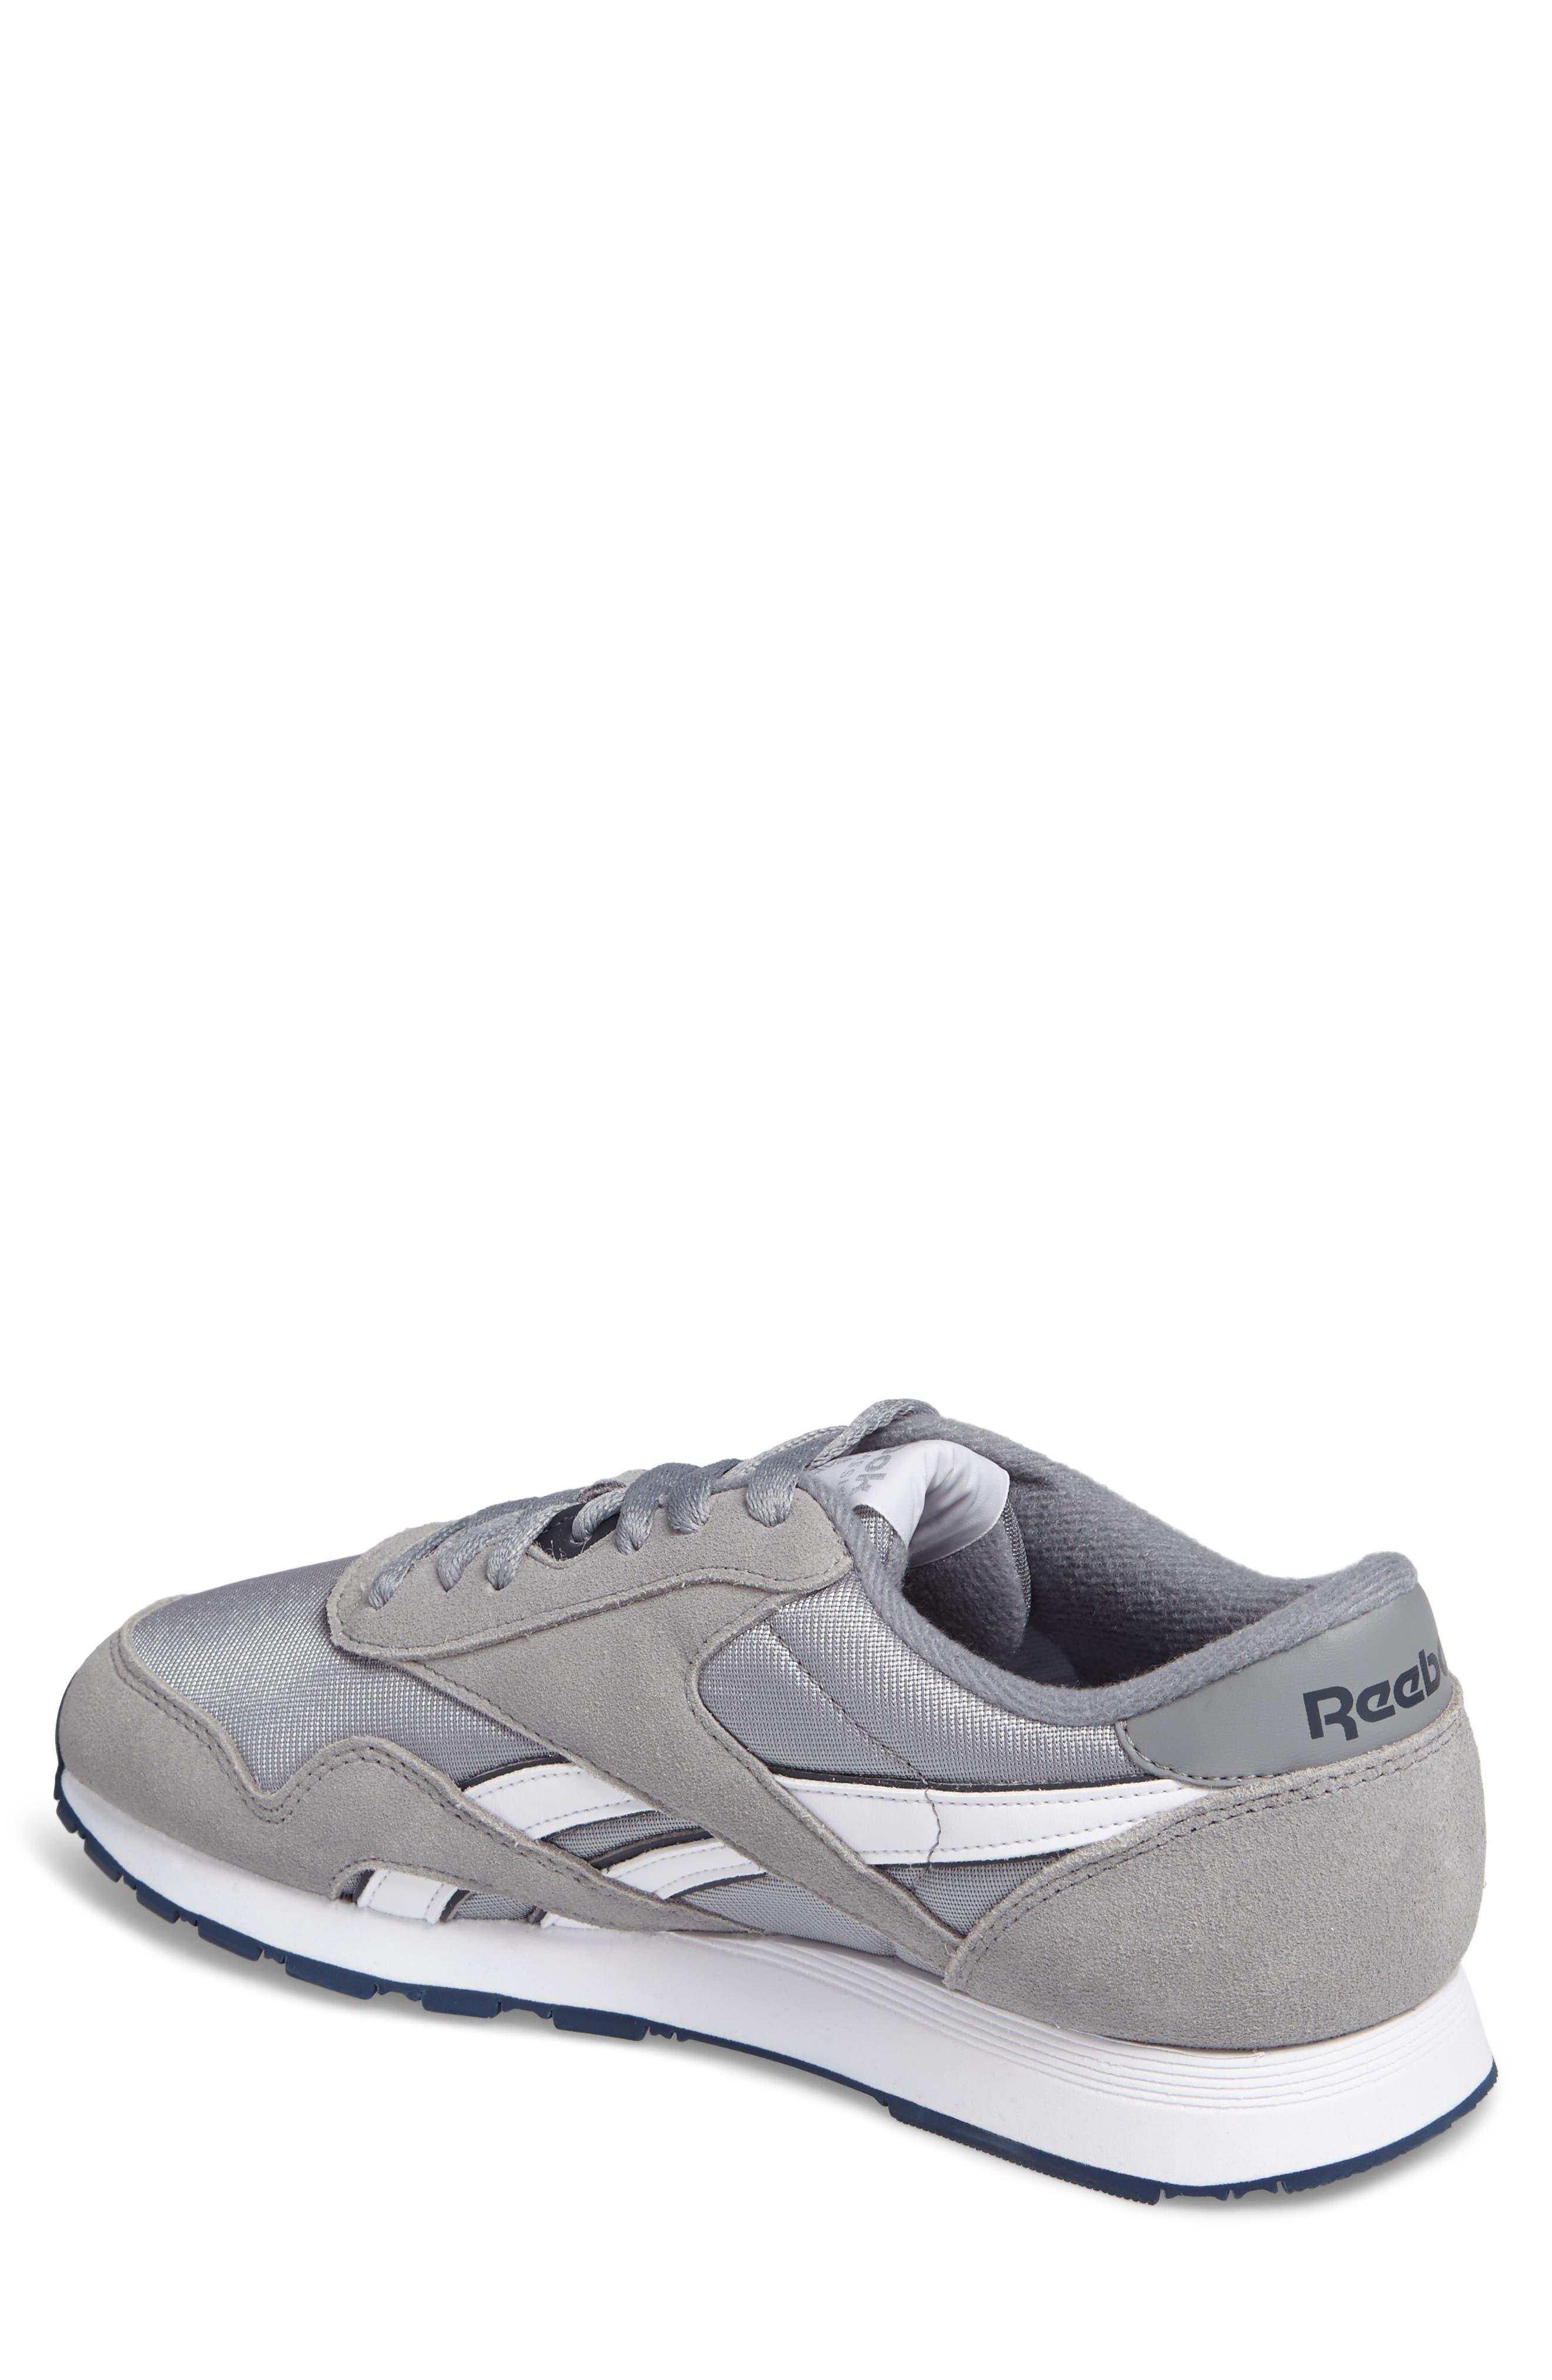 Alternate Image 2  - Reebok Classic Nylon Sneaker (Men)